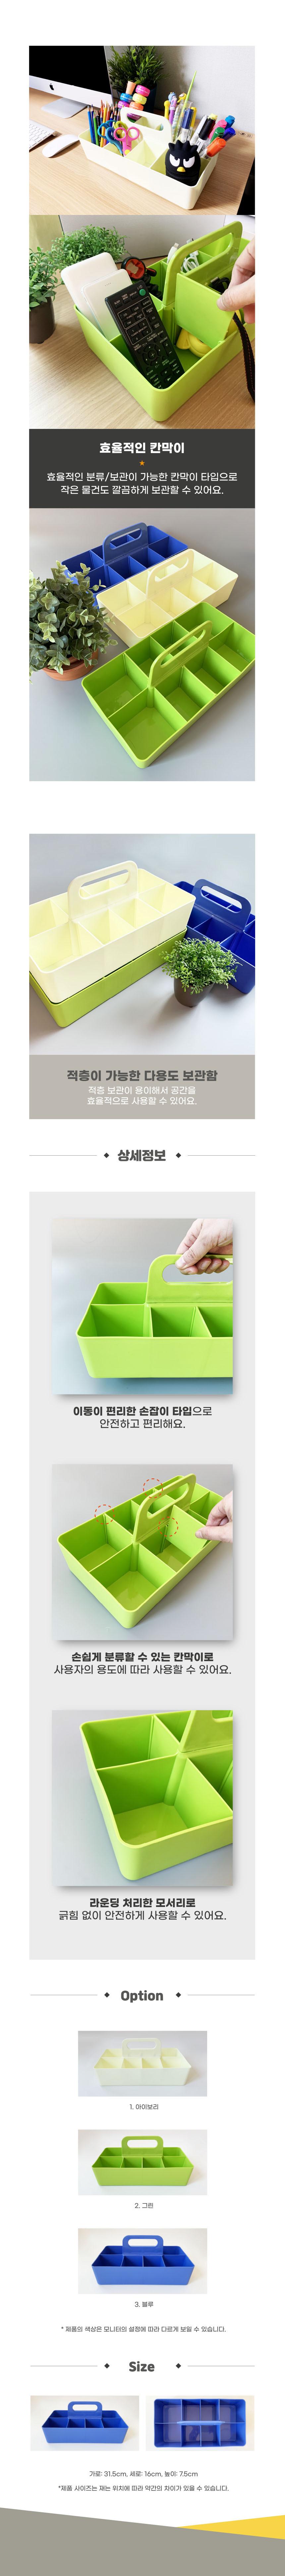 organizer2.jpg